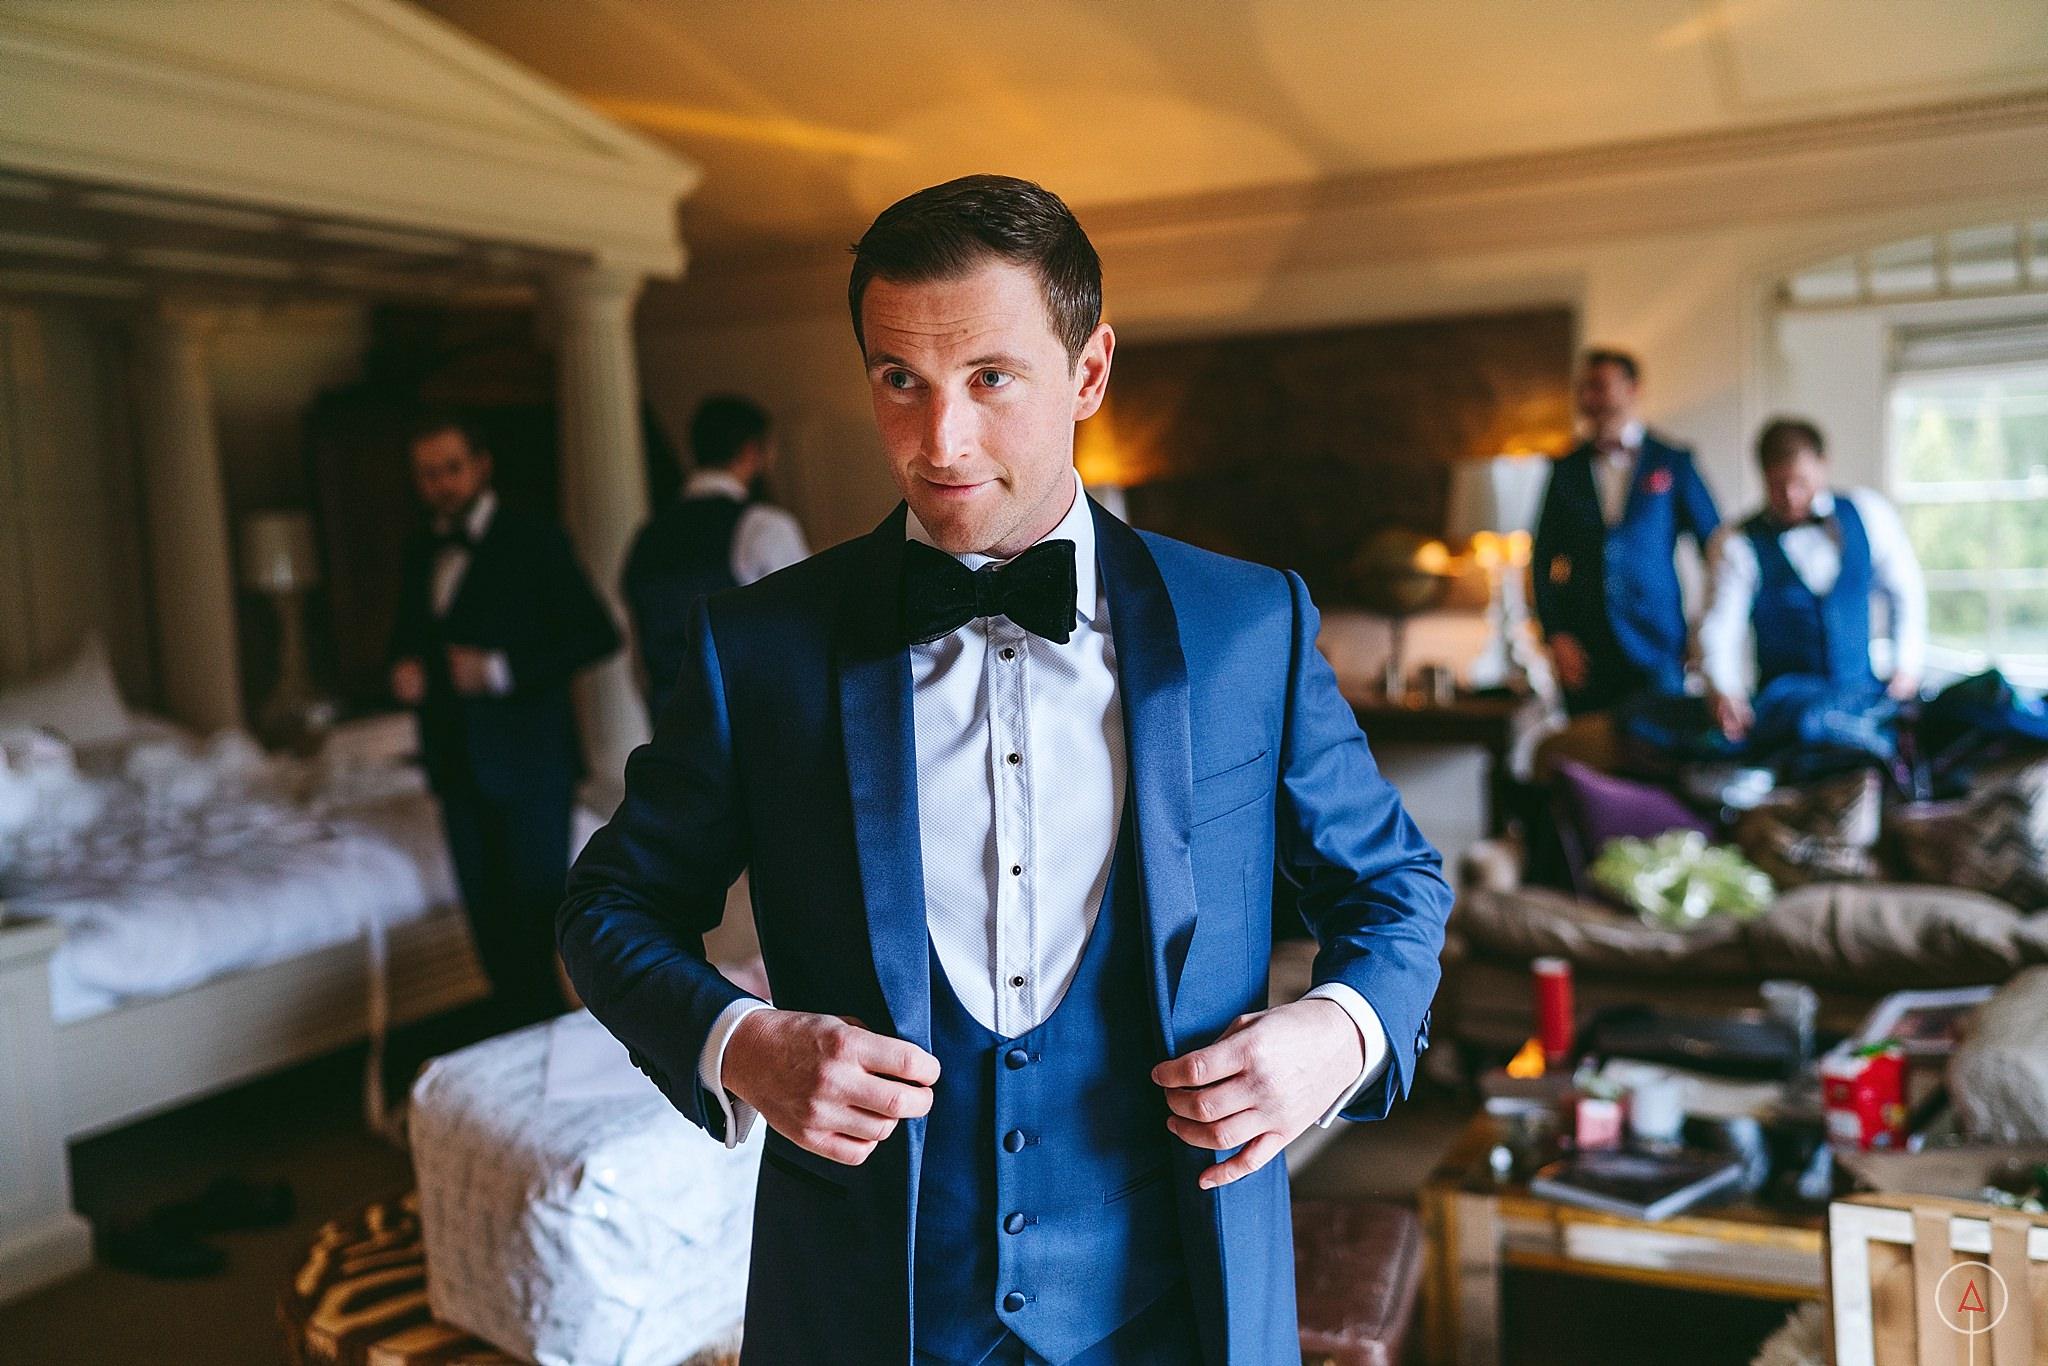 cardiff-wedding-photographer-aga-tomaszek_0230